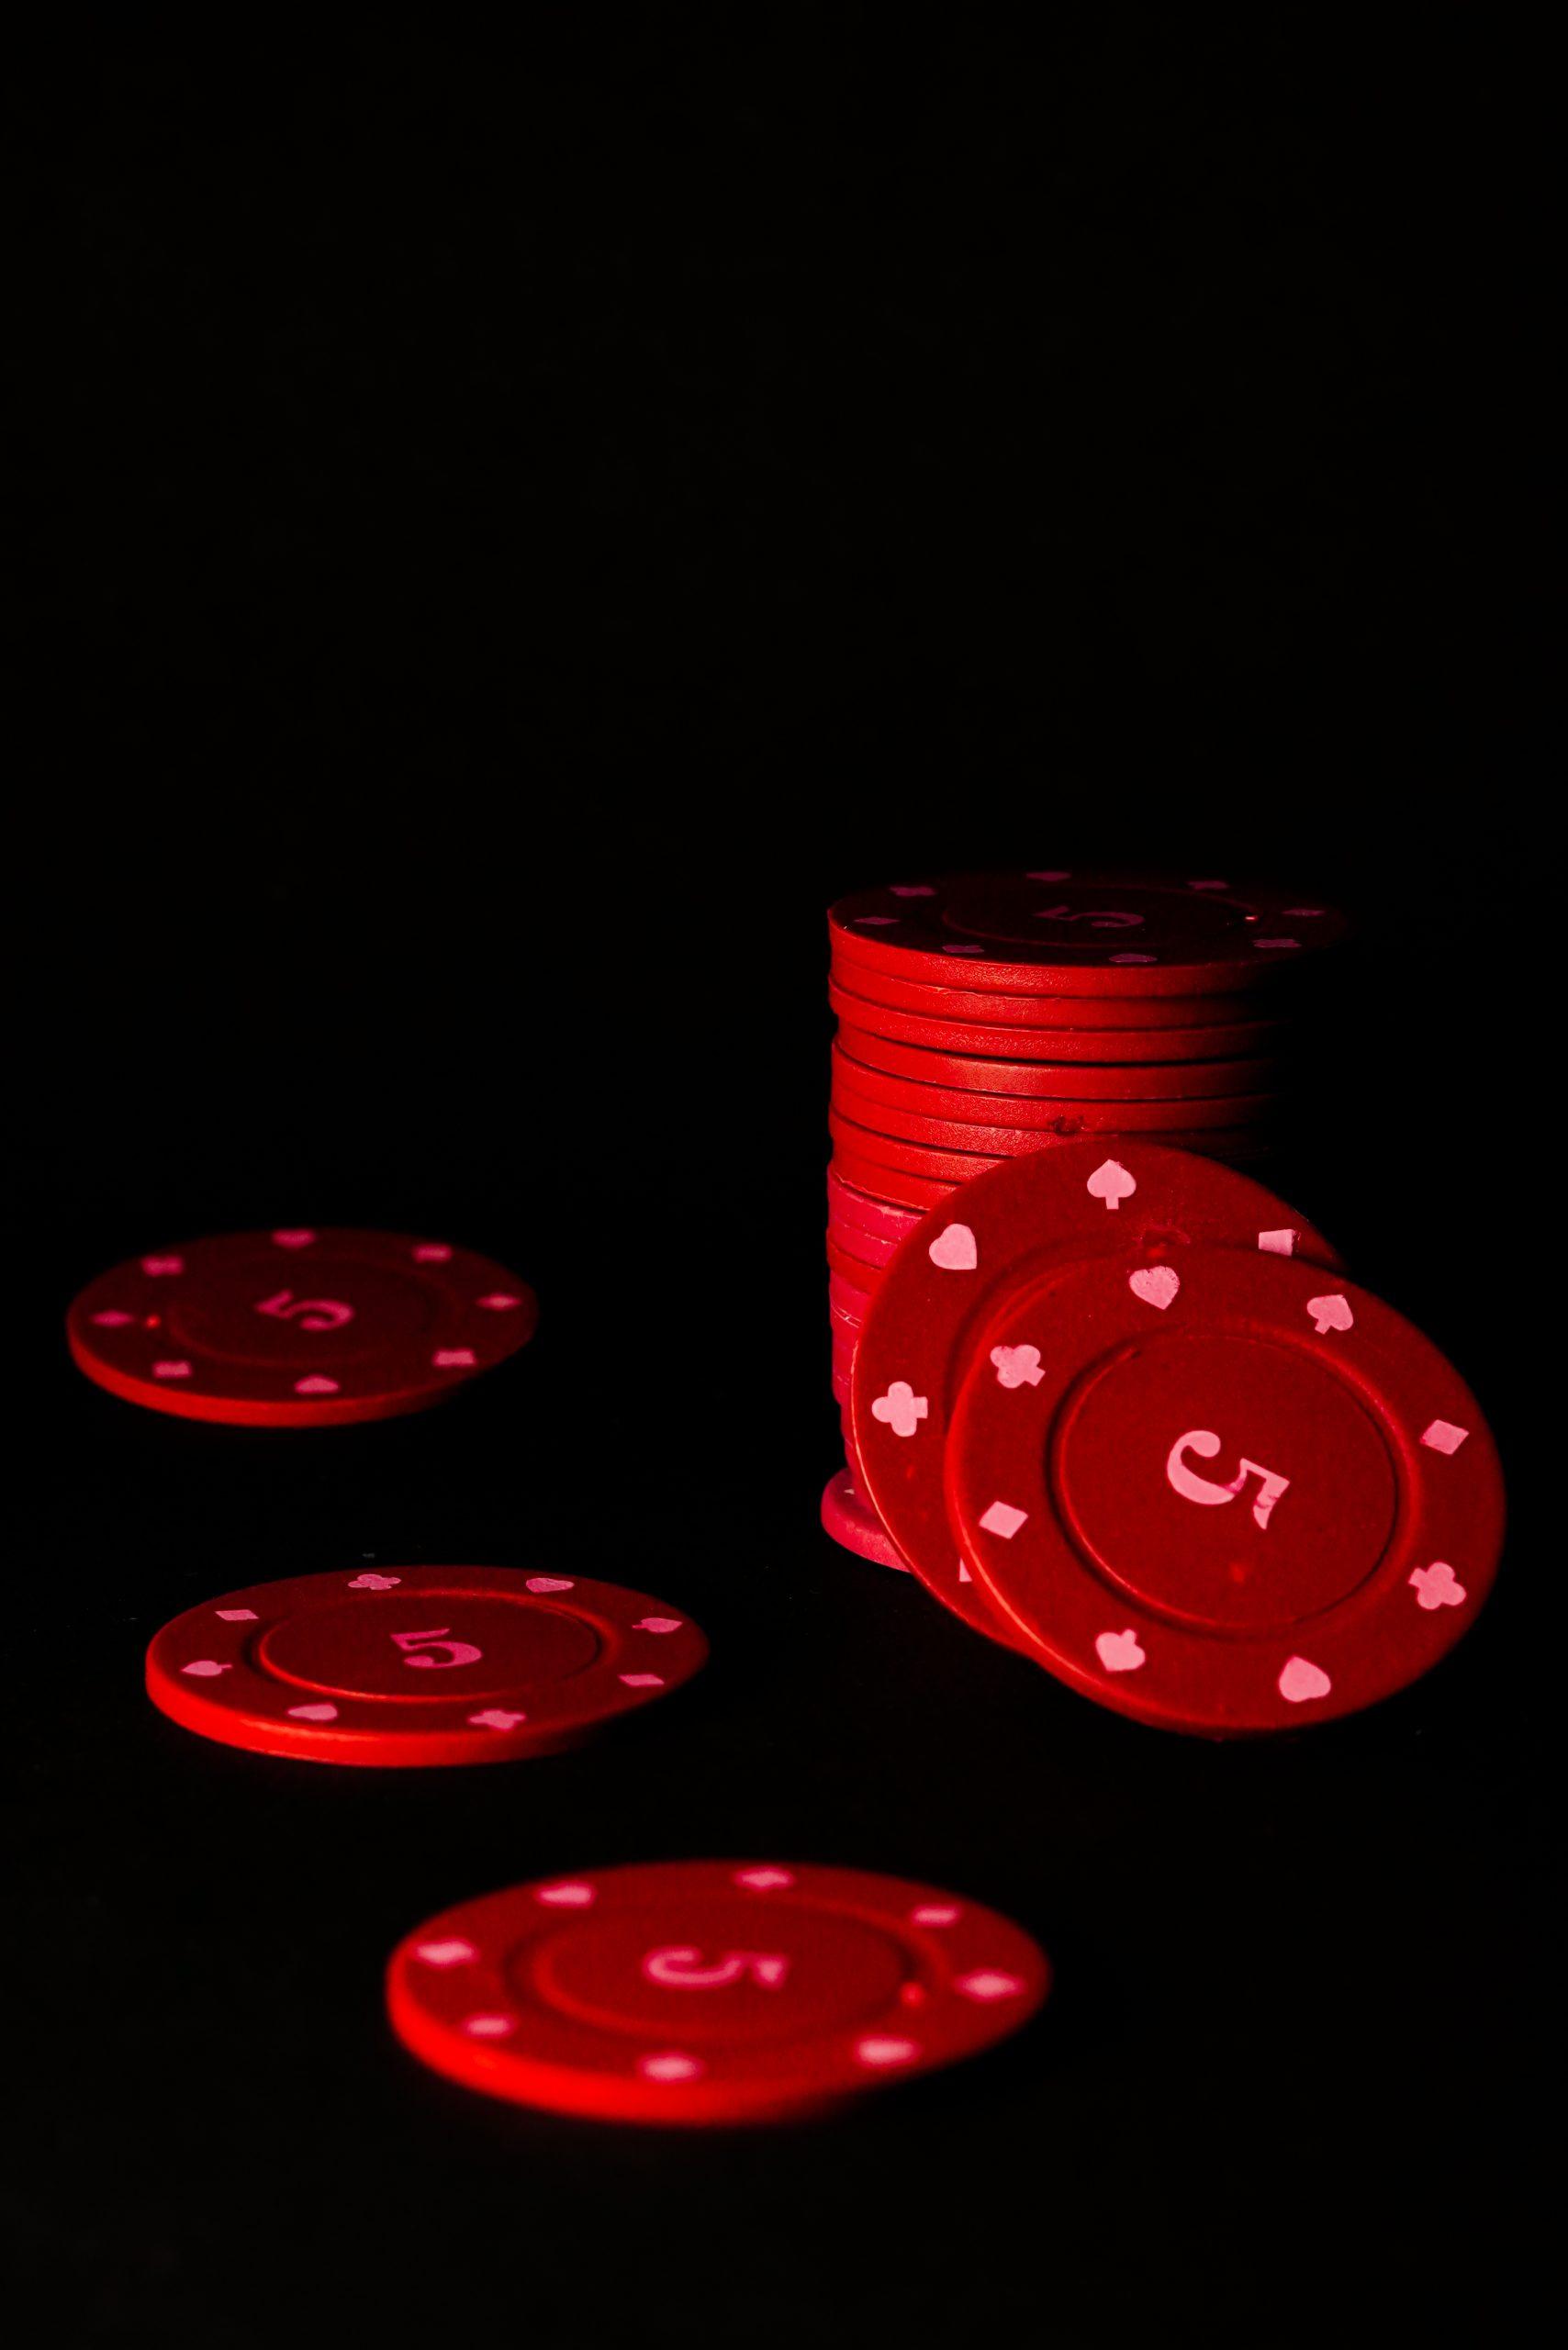 Red Poker Chips